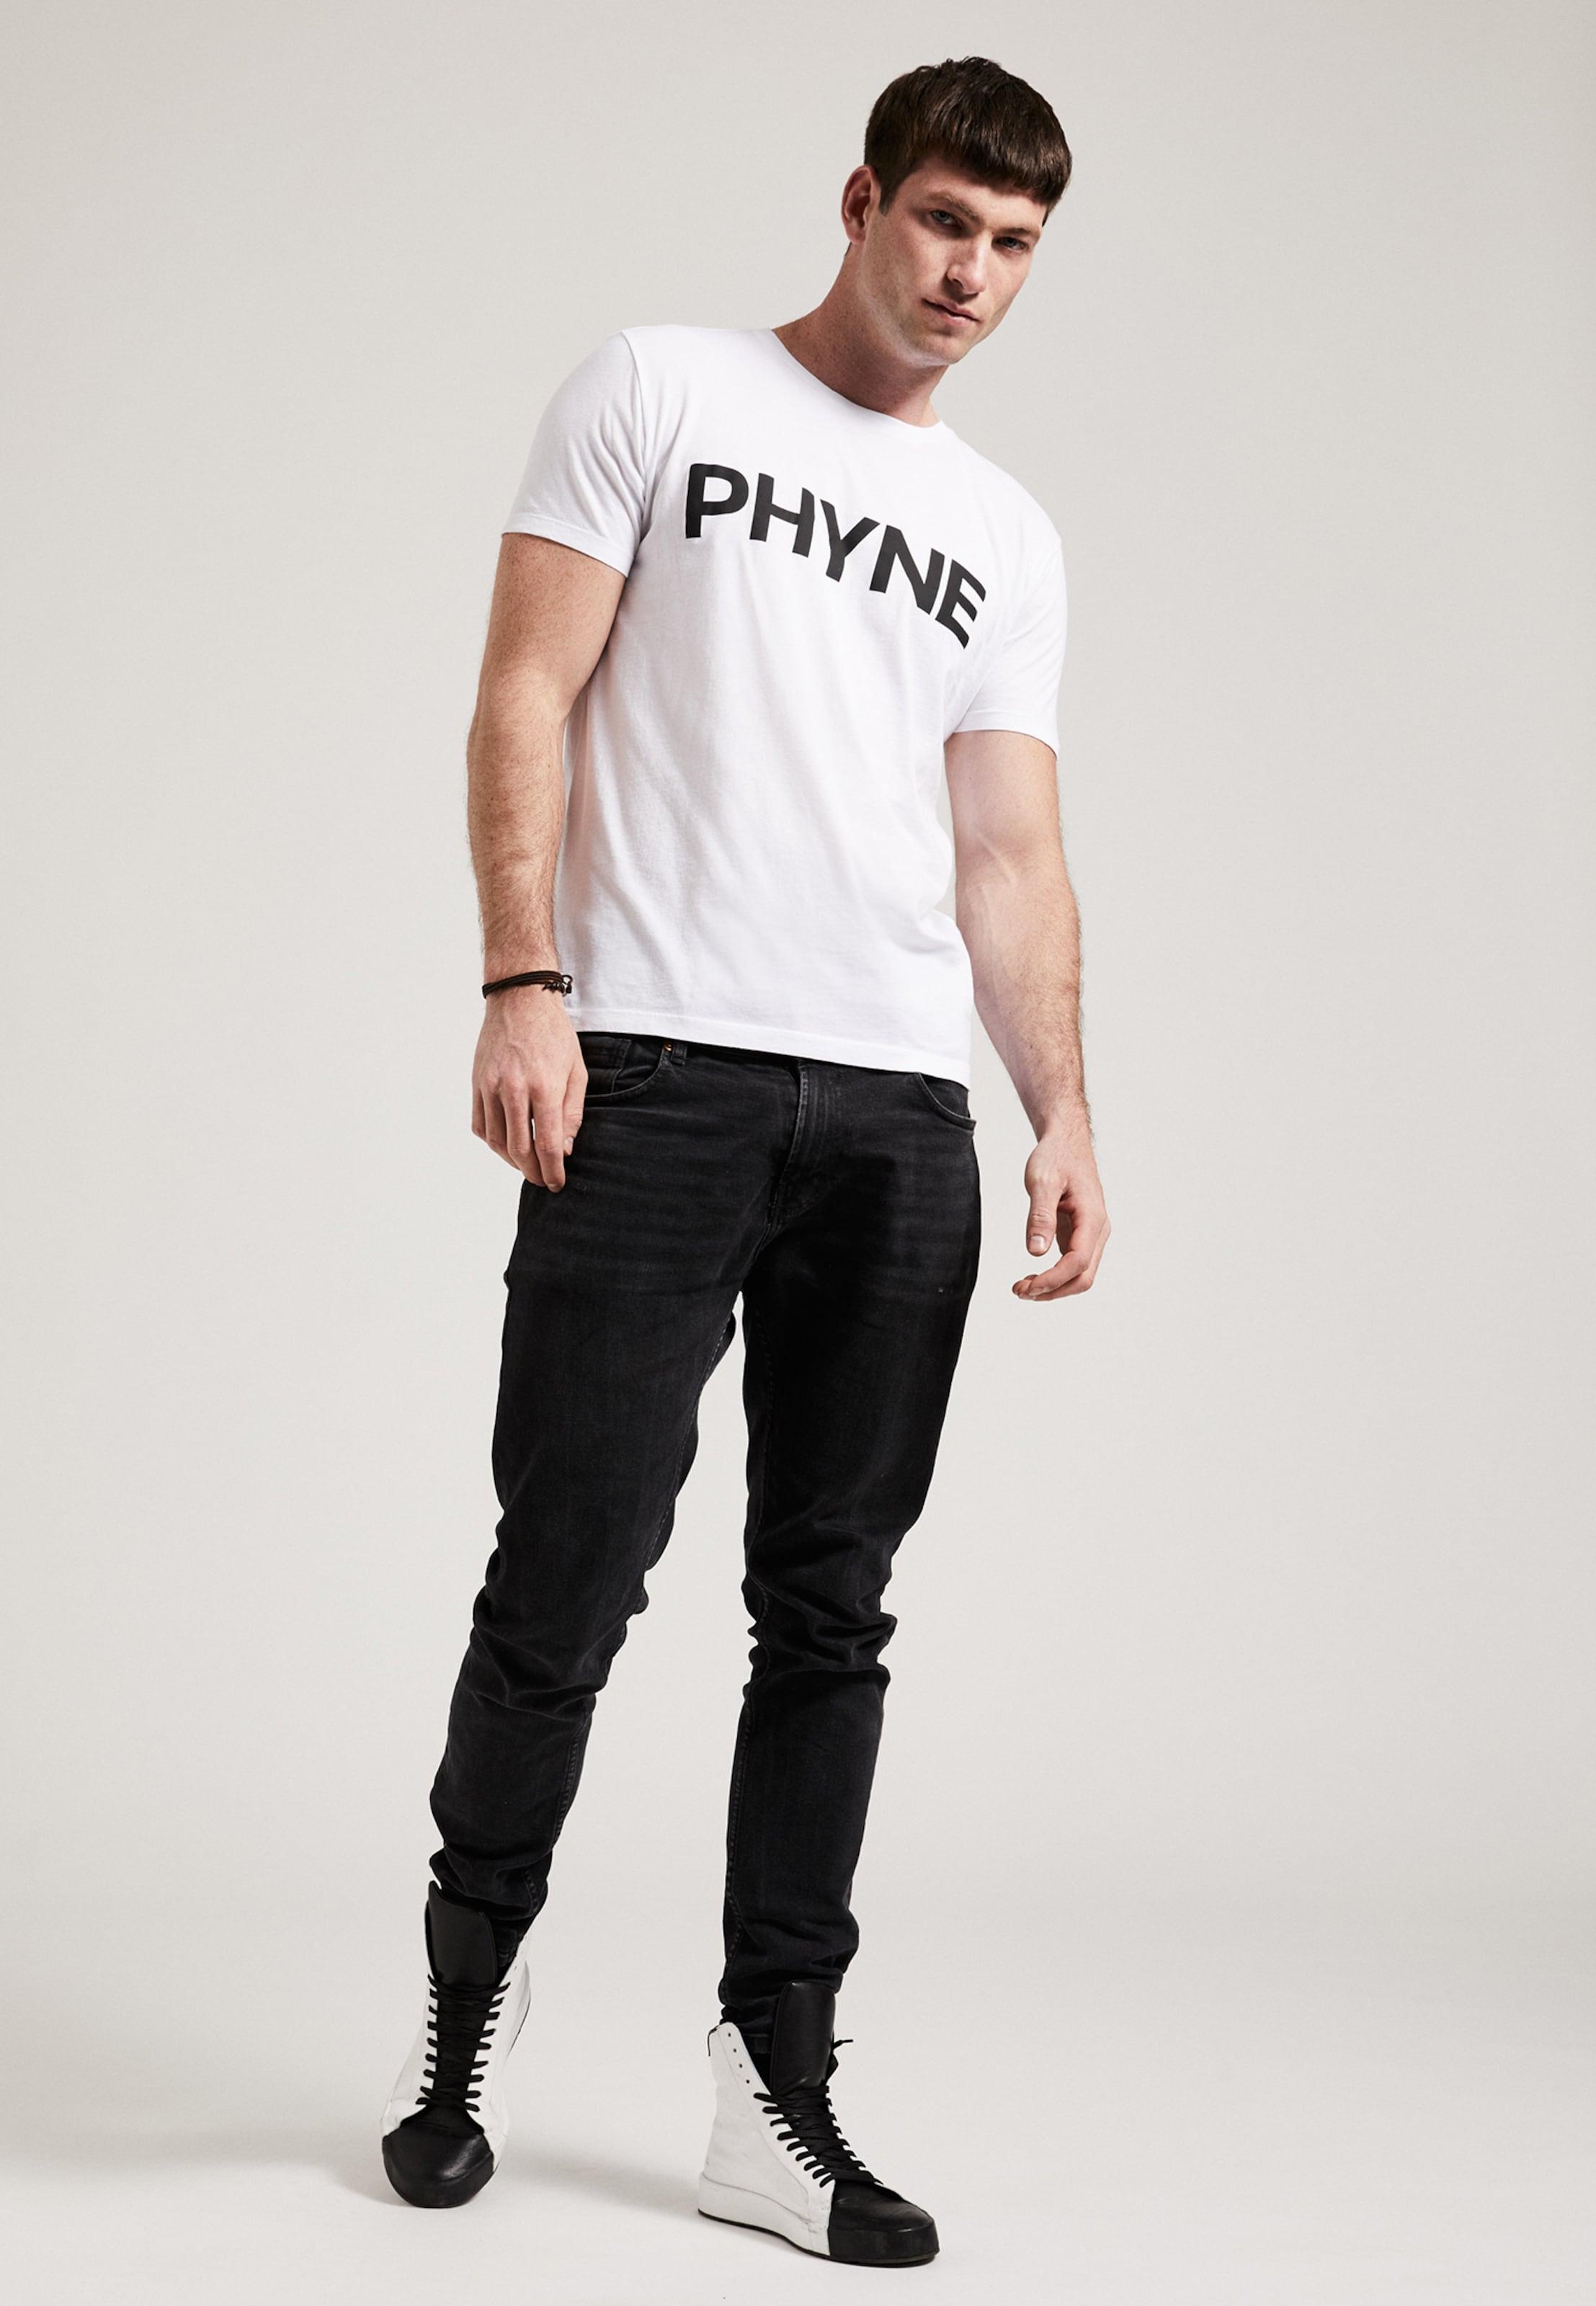 In Phyne In shirt T SchwarzWeiß shirt T Phyne trdxohCsBQ